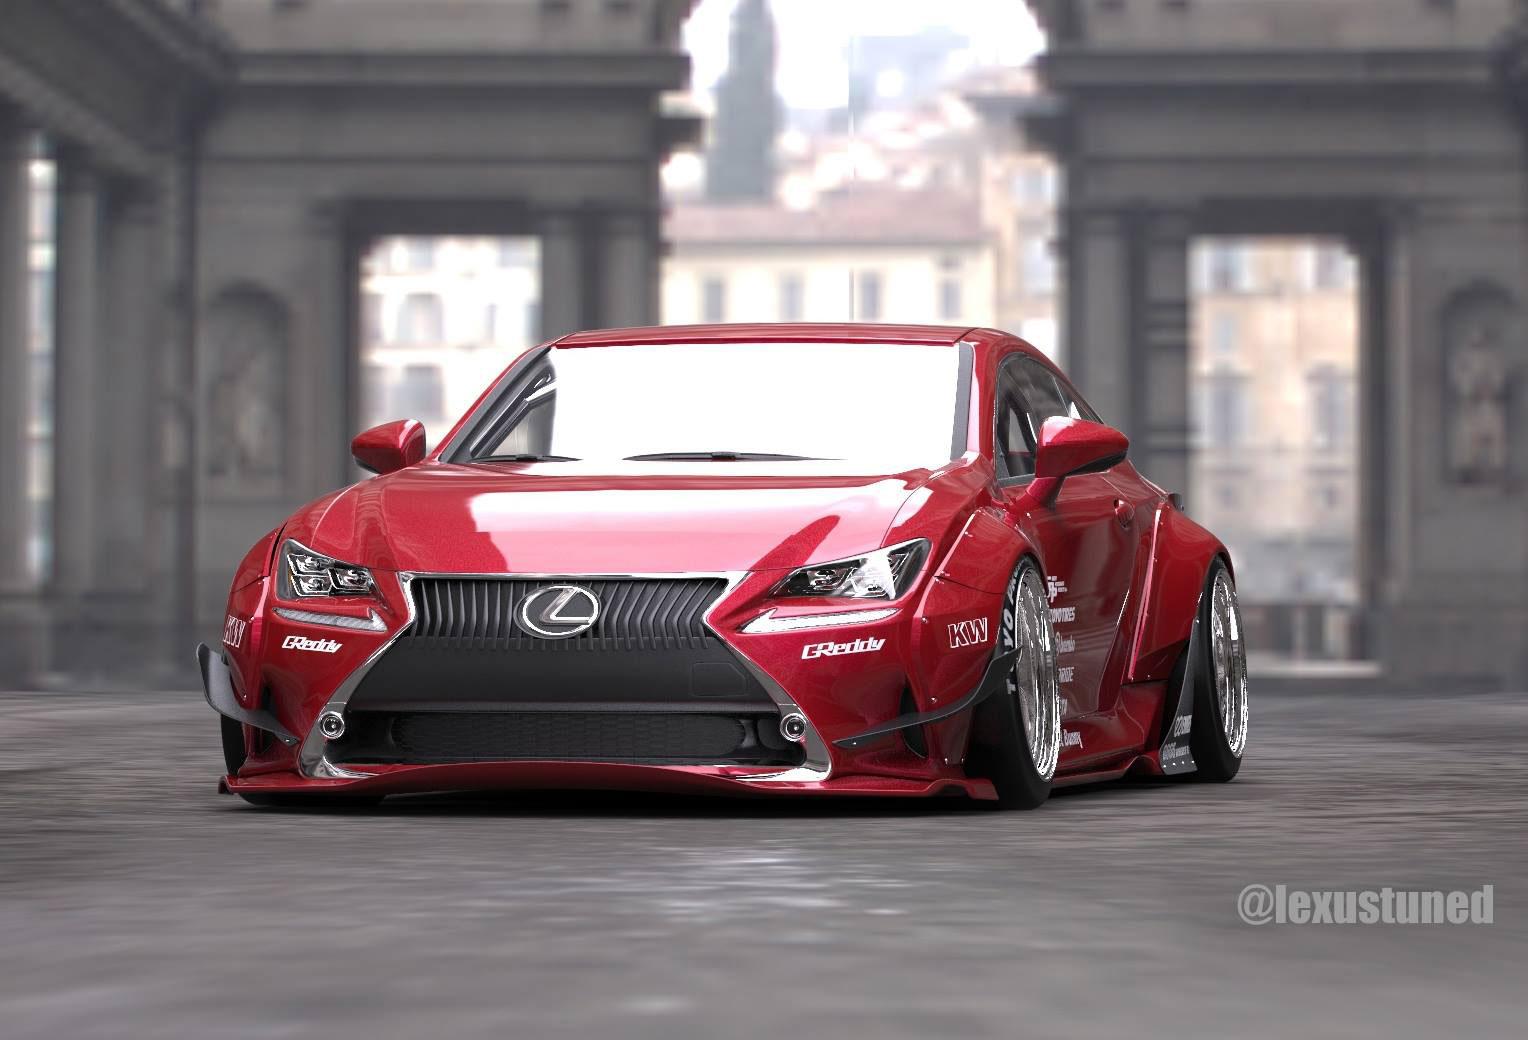 Rocket Bunny Lexus Rc F >> Rocket Bunny Lexus RC F SPORT Coming to SEMA | Lexus Enthusiast